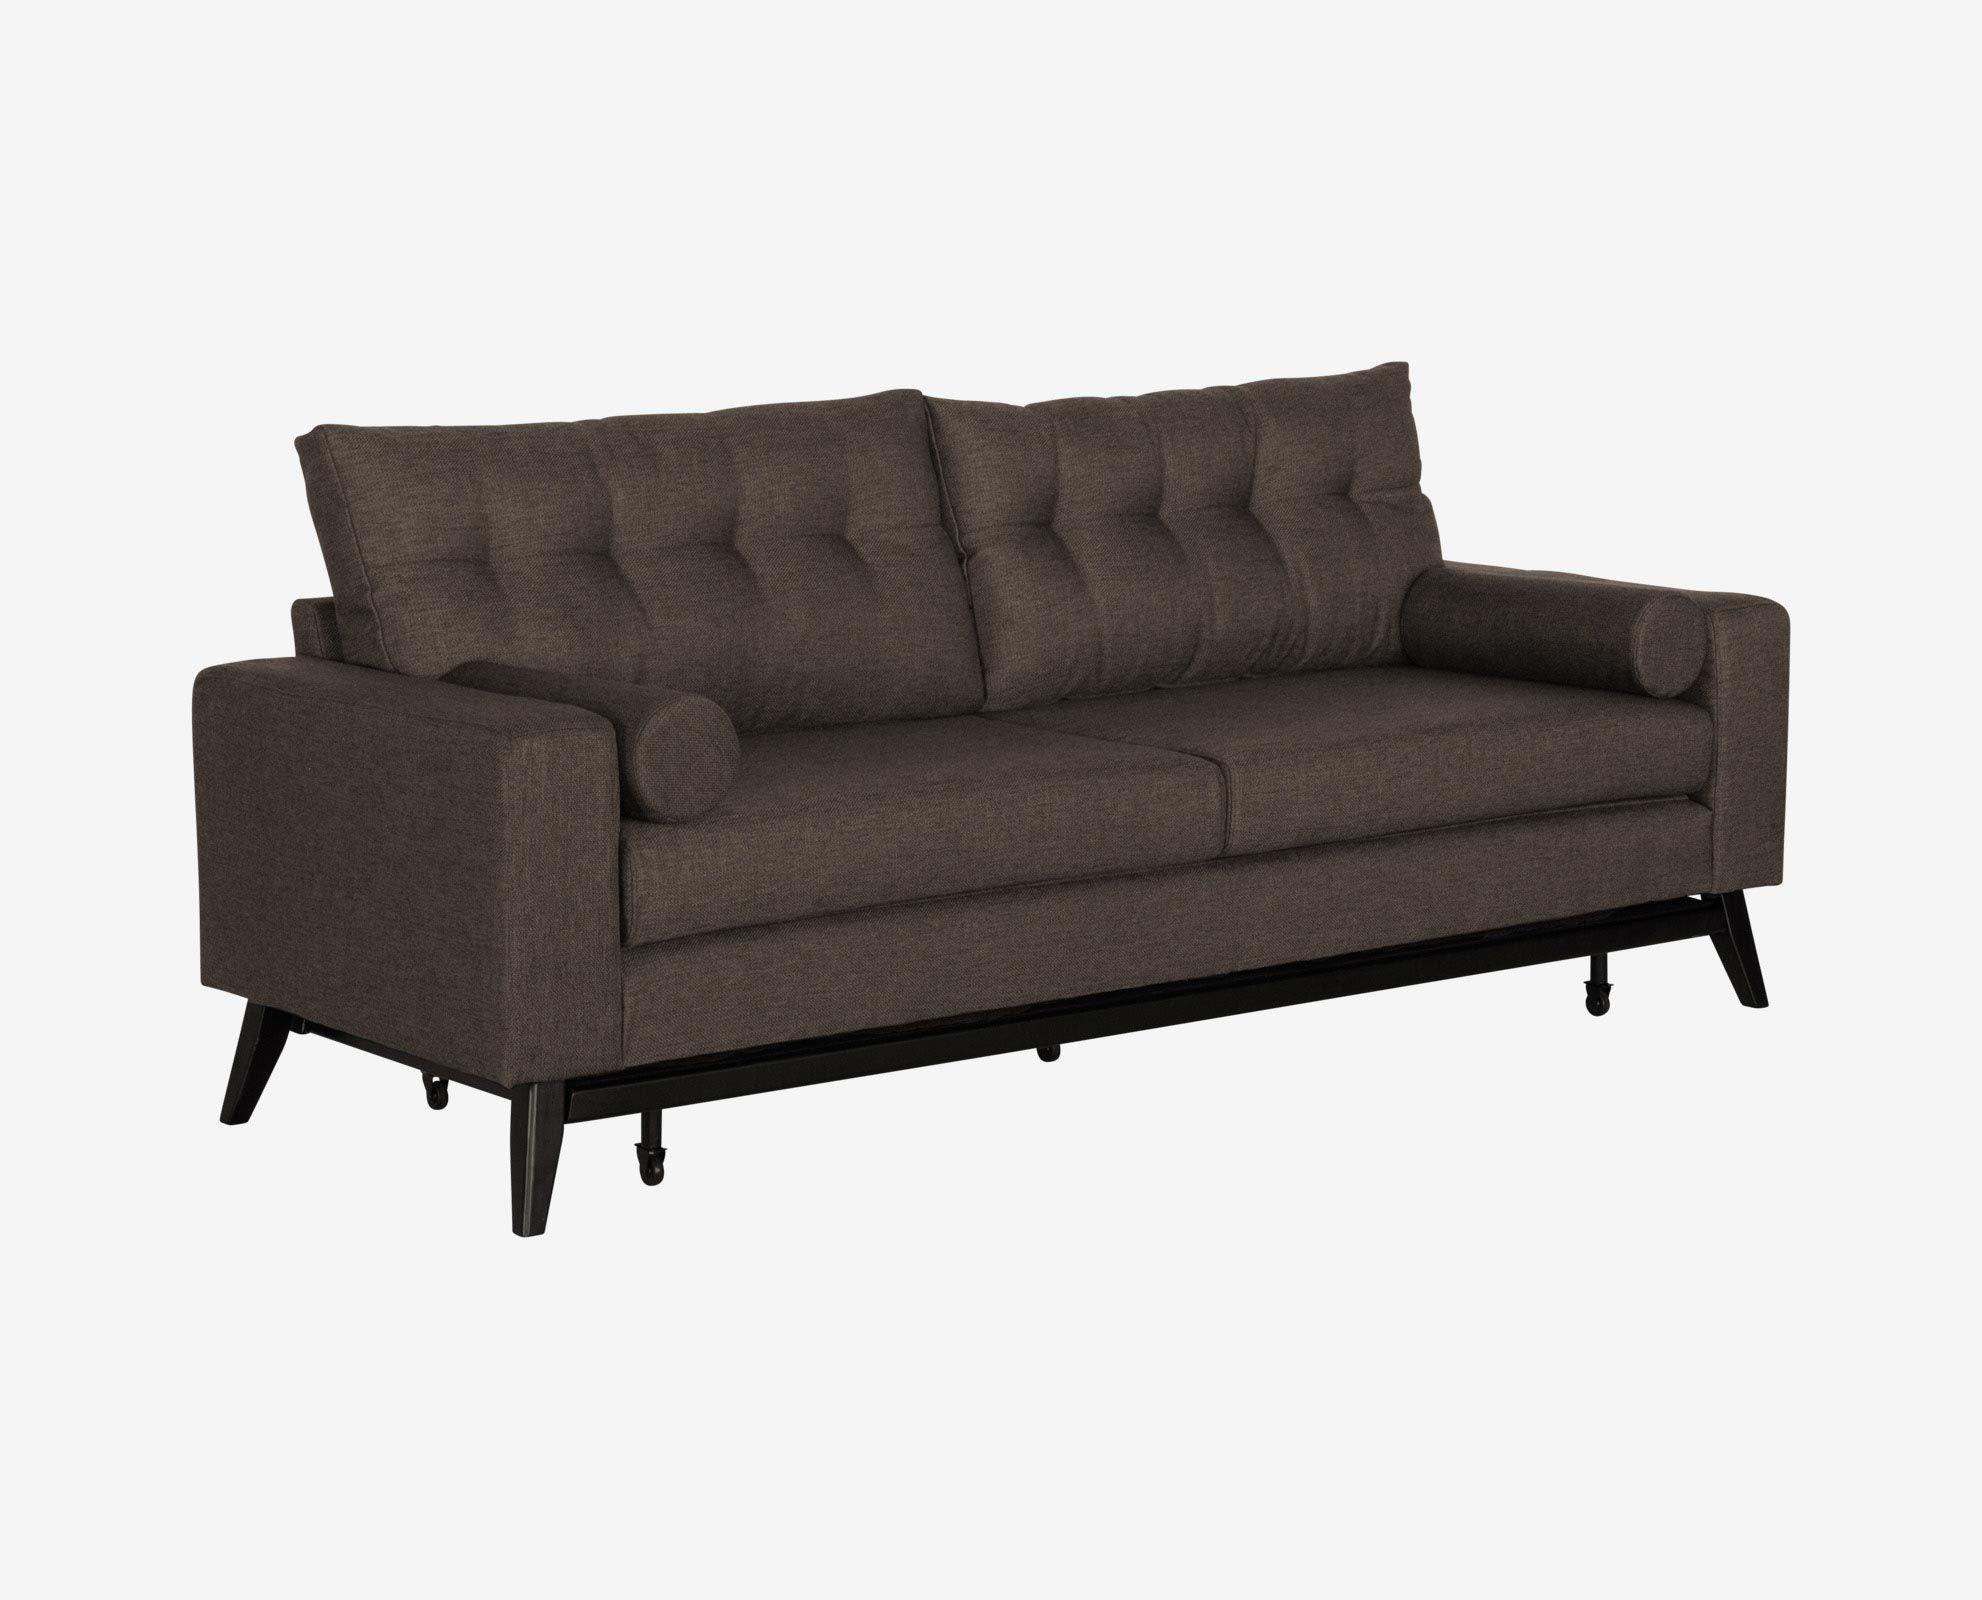 Dania Sleeper Couch | Bruin Blog